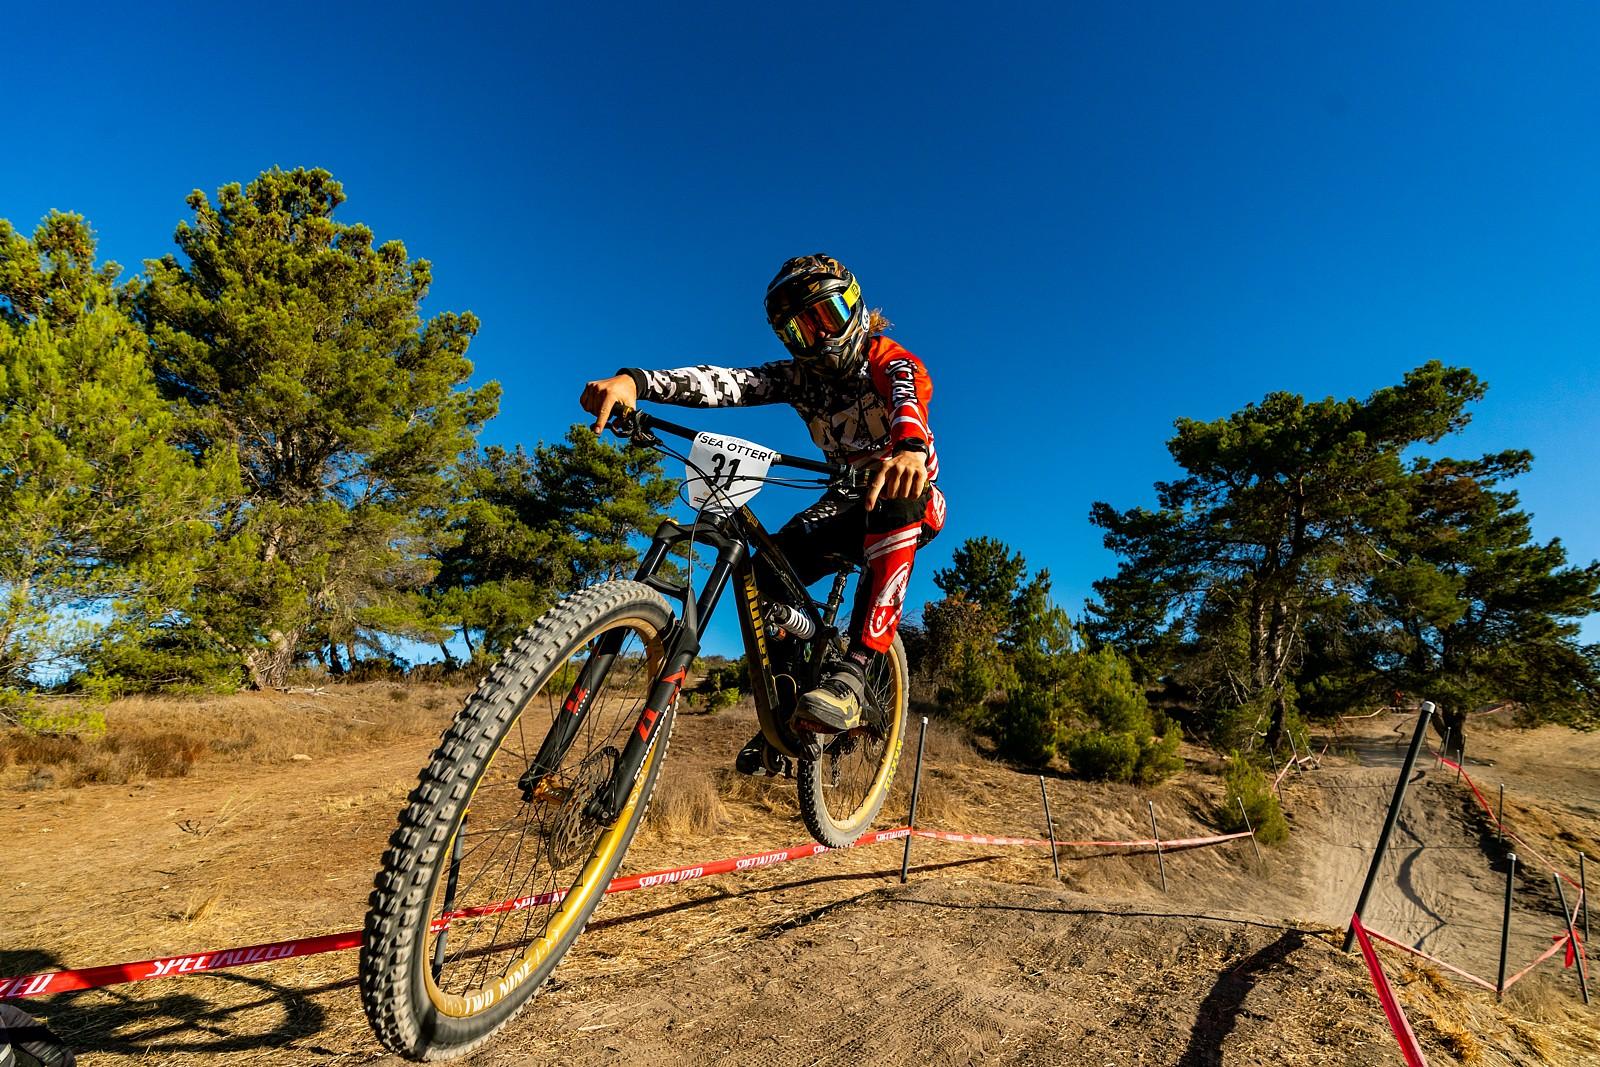 Graeme Pitts - Zuestman - Mountain Biking Pictures - Vital MTB